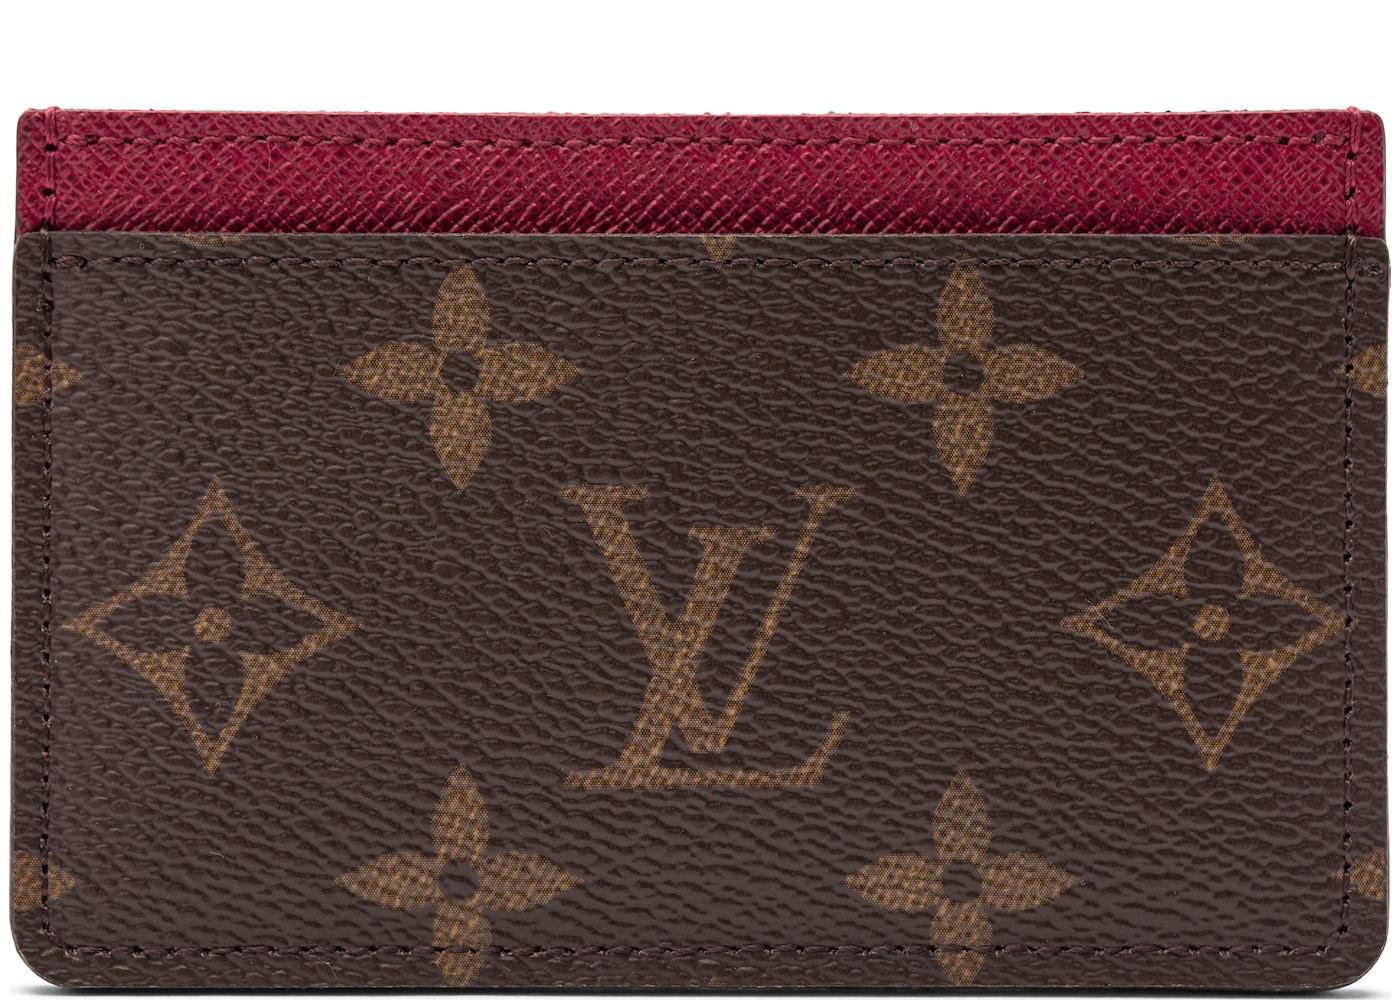 e799e9f34d9e Louis Vuitton Card Holder Monogram Fuchsia. Monogram Fuchsia